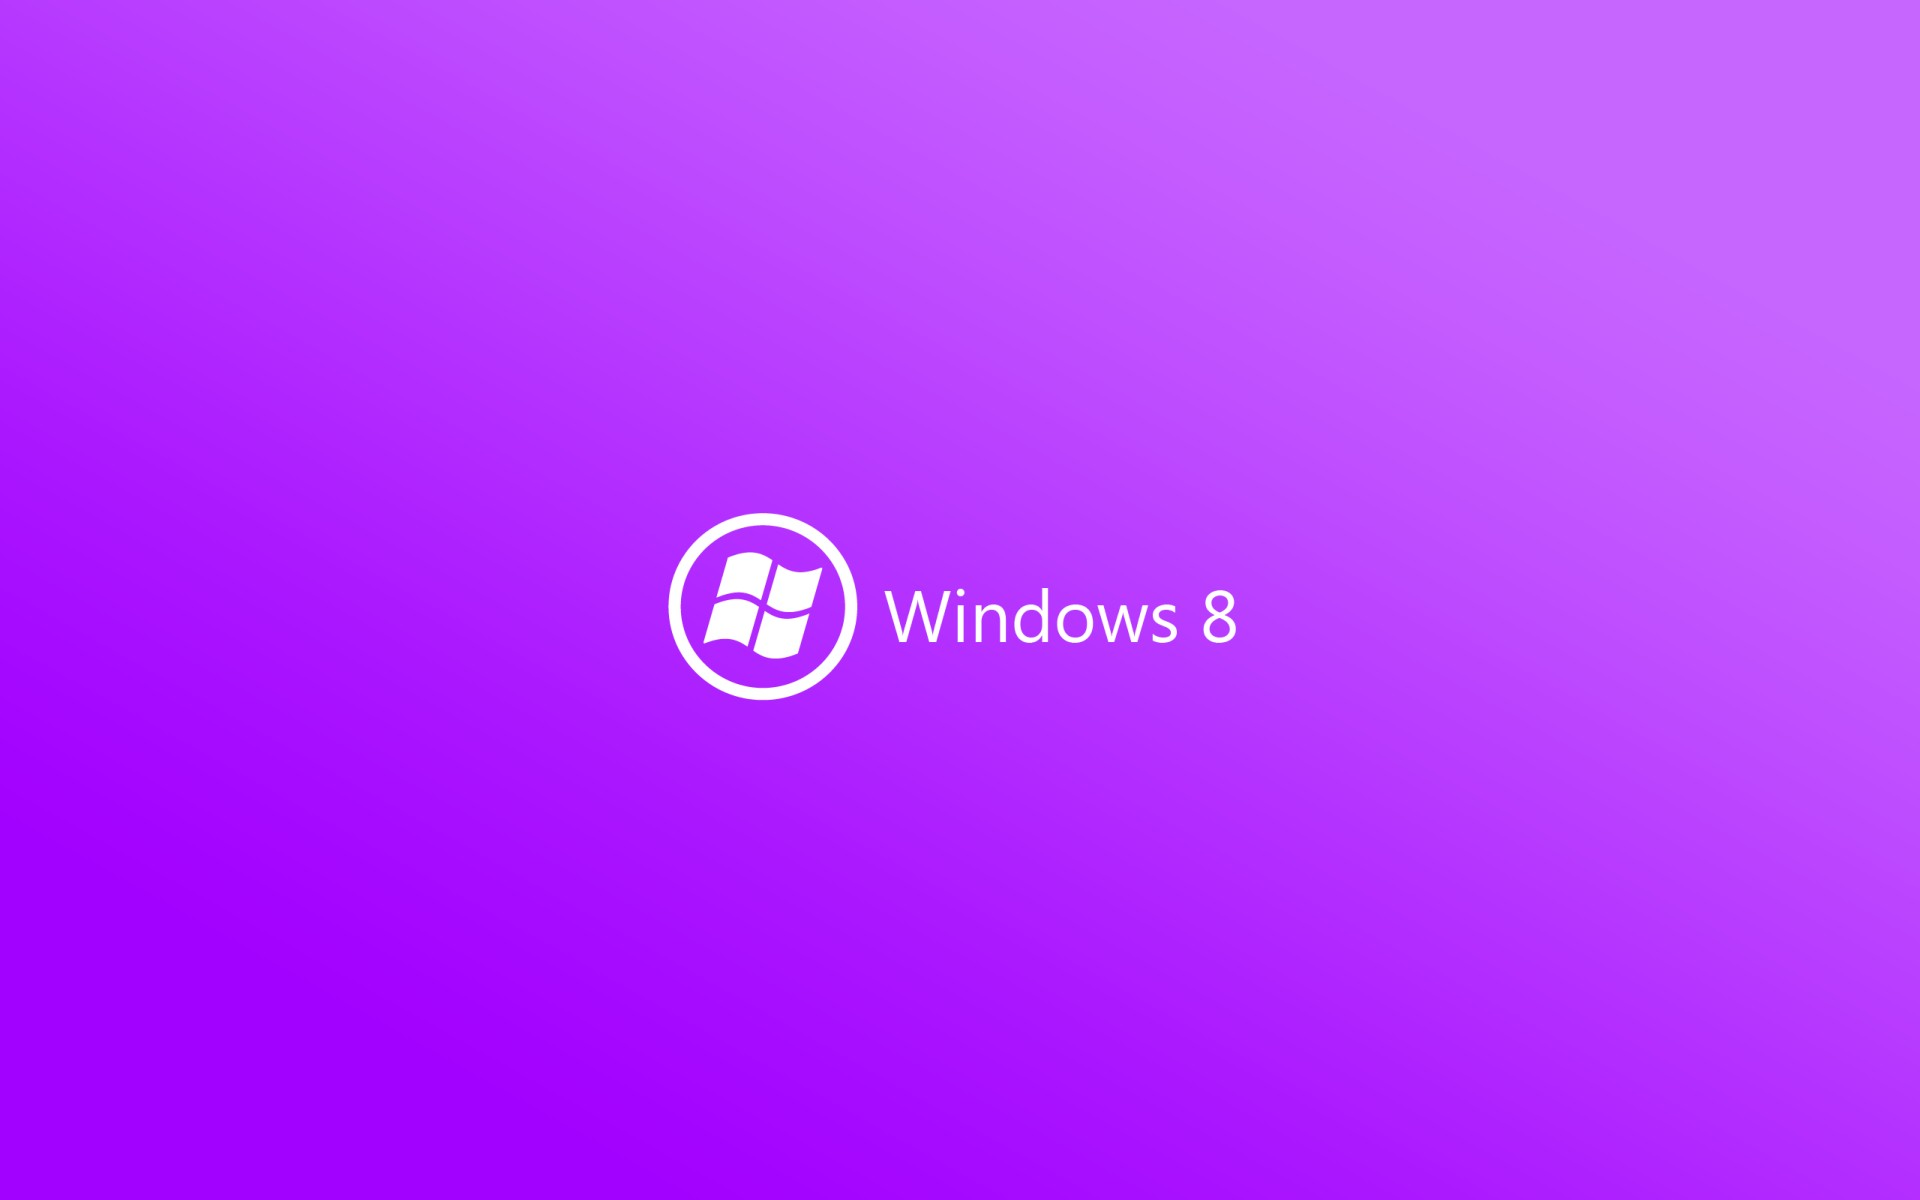 Windows 8 Wallpapers With Logo 10 Hd Wallpapers Techmumbai